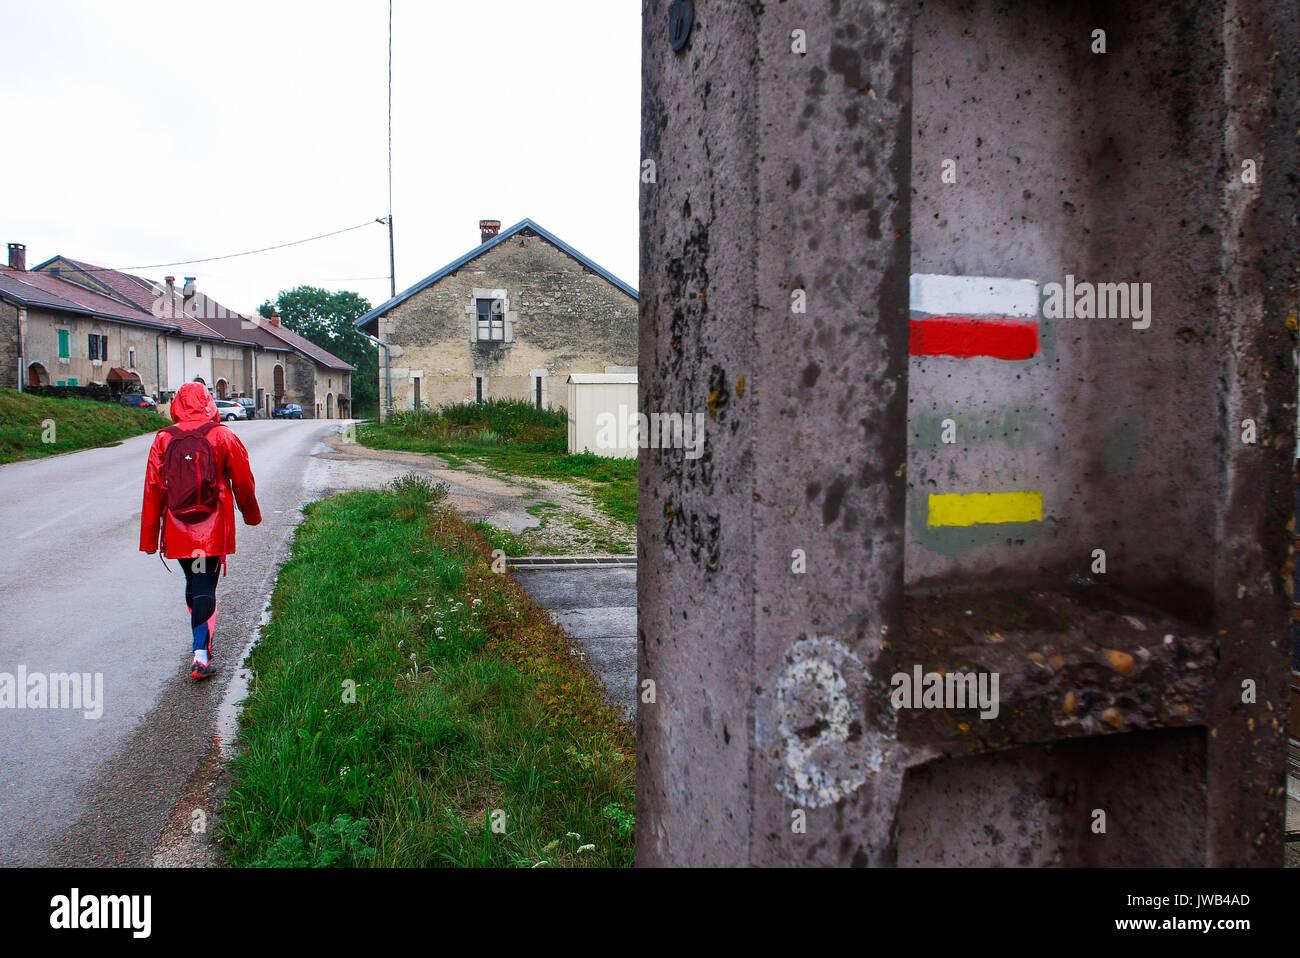 Hiking in Jura country, Les Bez, Franche-Comté, Jura (France) - Stock Image